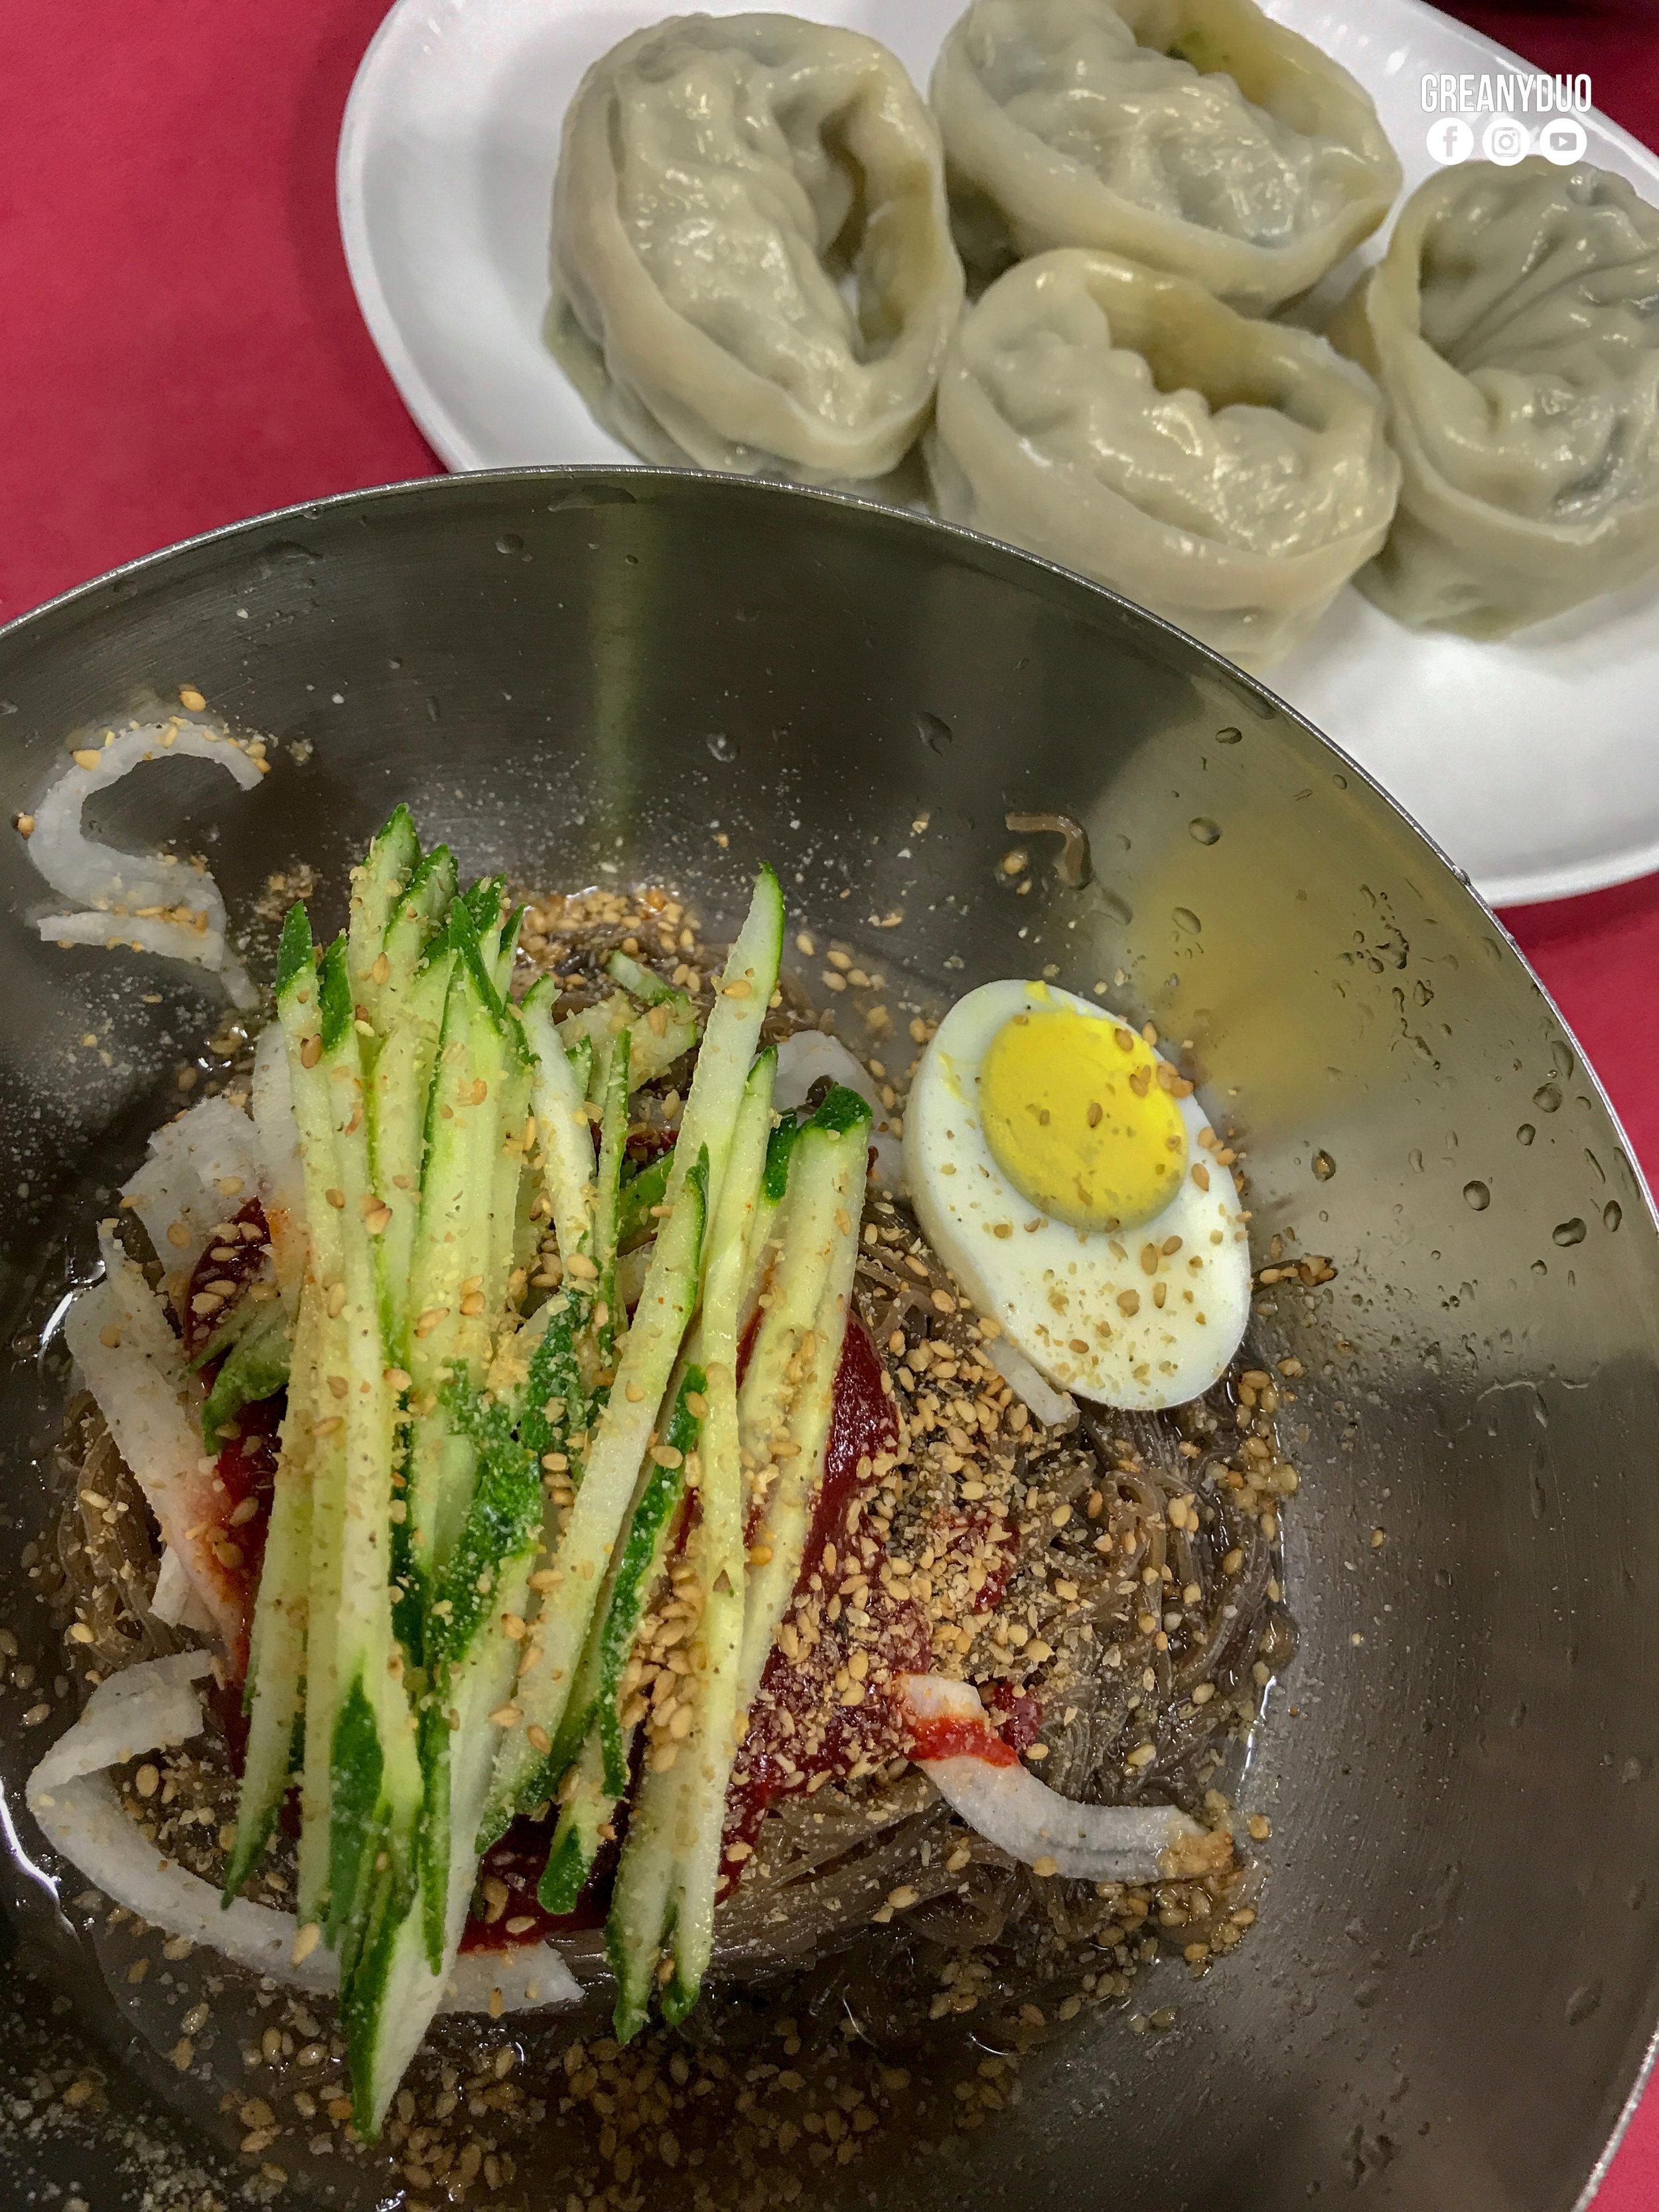 030Seoul_Food_WM.jpg